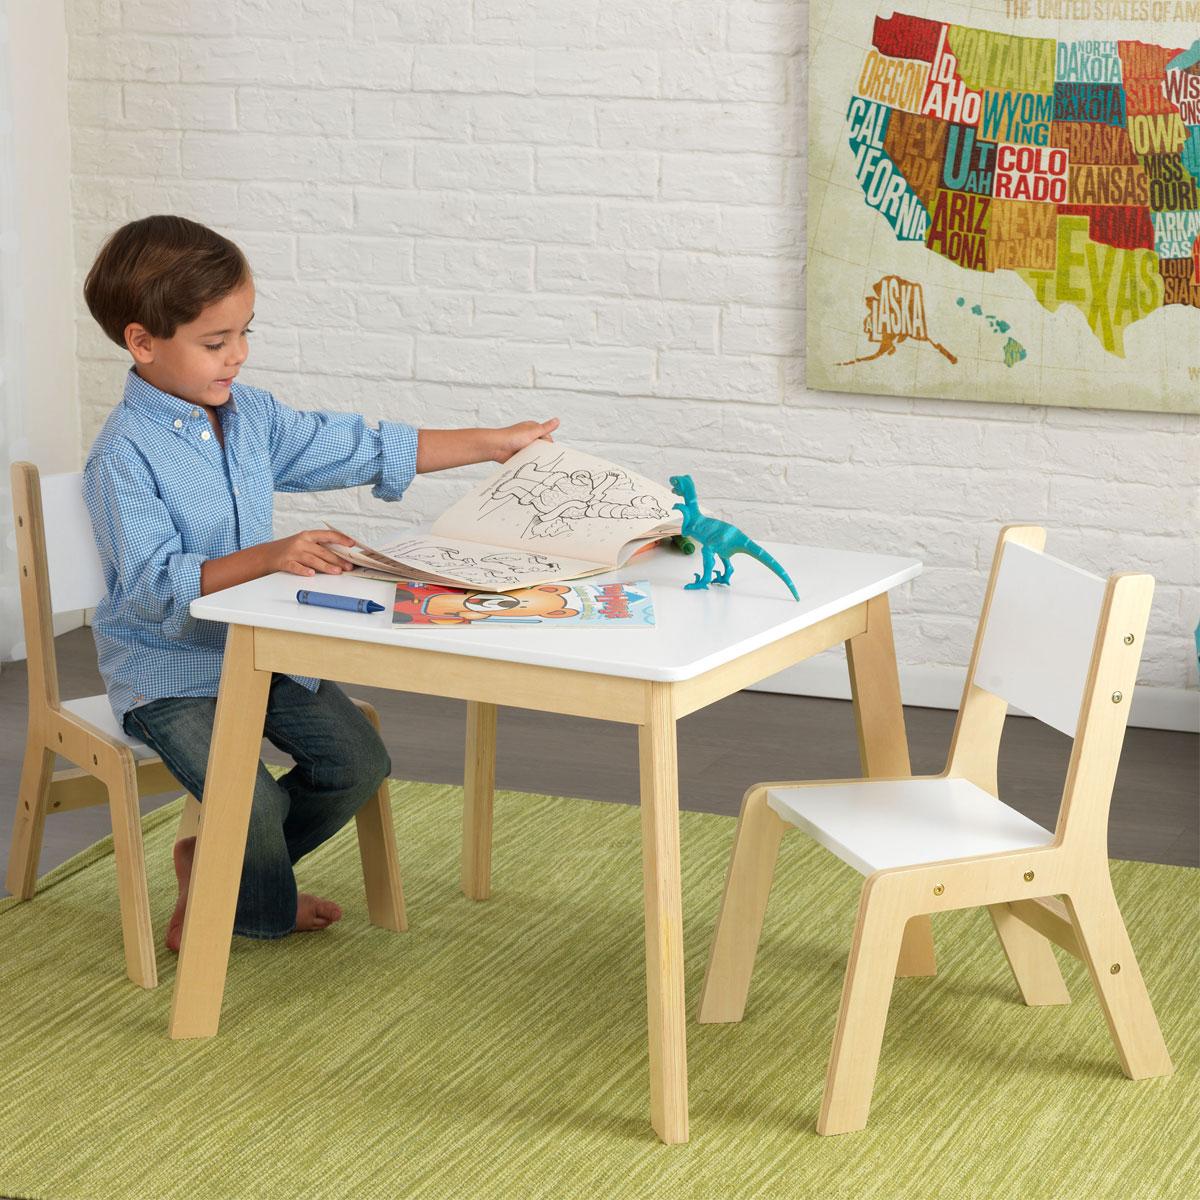 Kidkraft tavolo moderno con due sedie 27025 giocattoli - Tavolo con sedie frozen ...